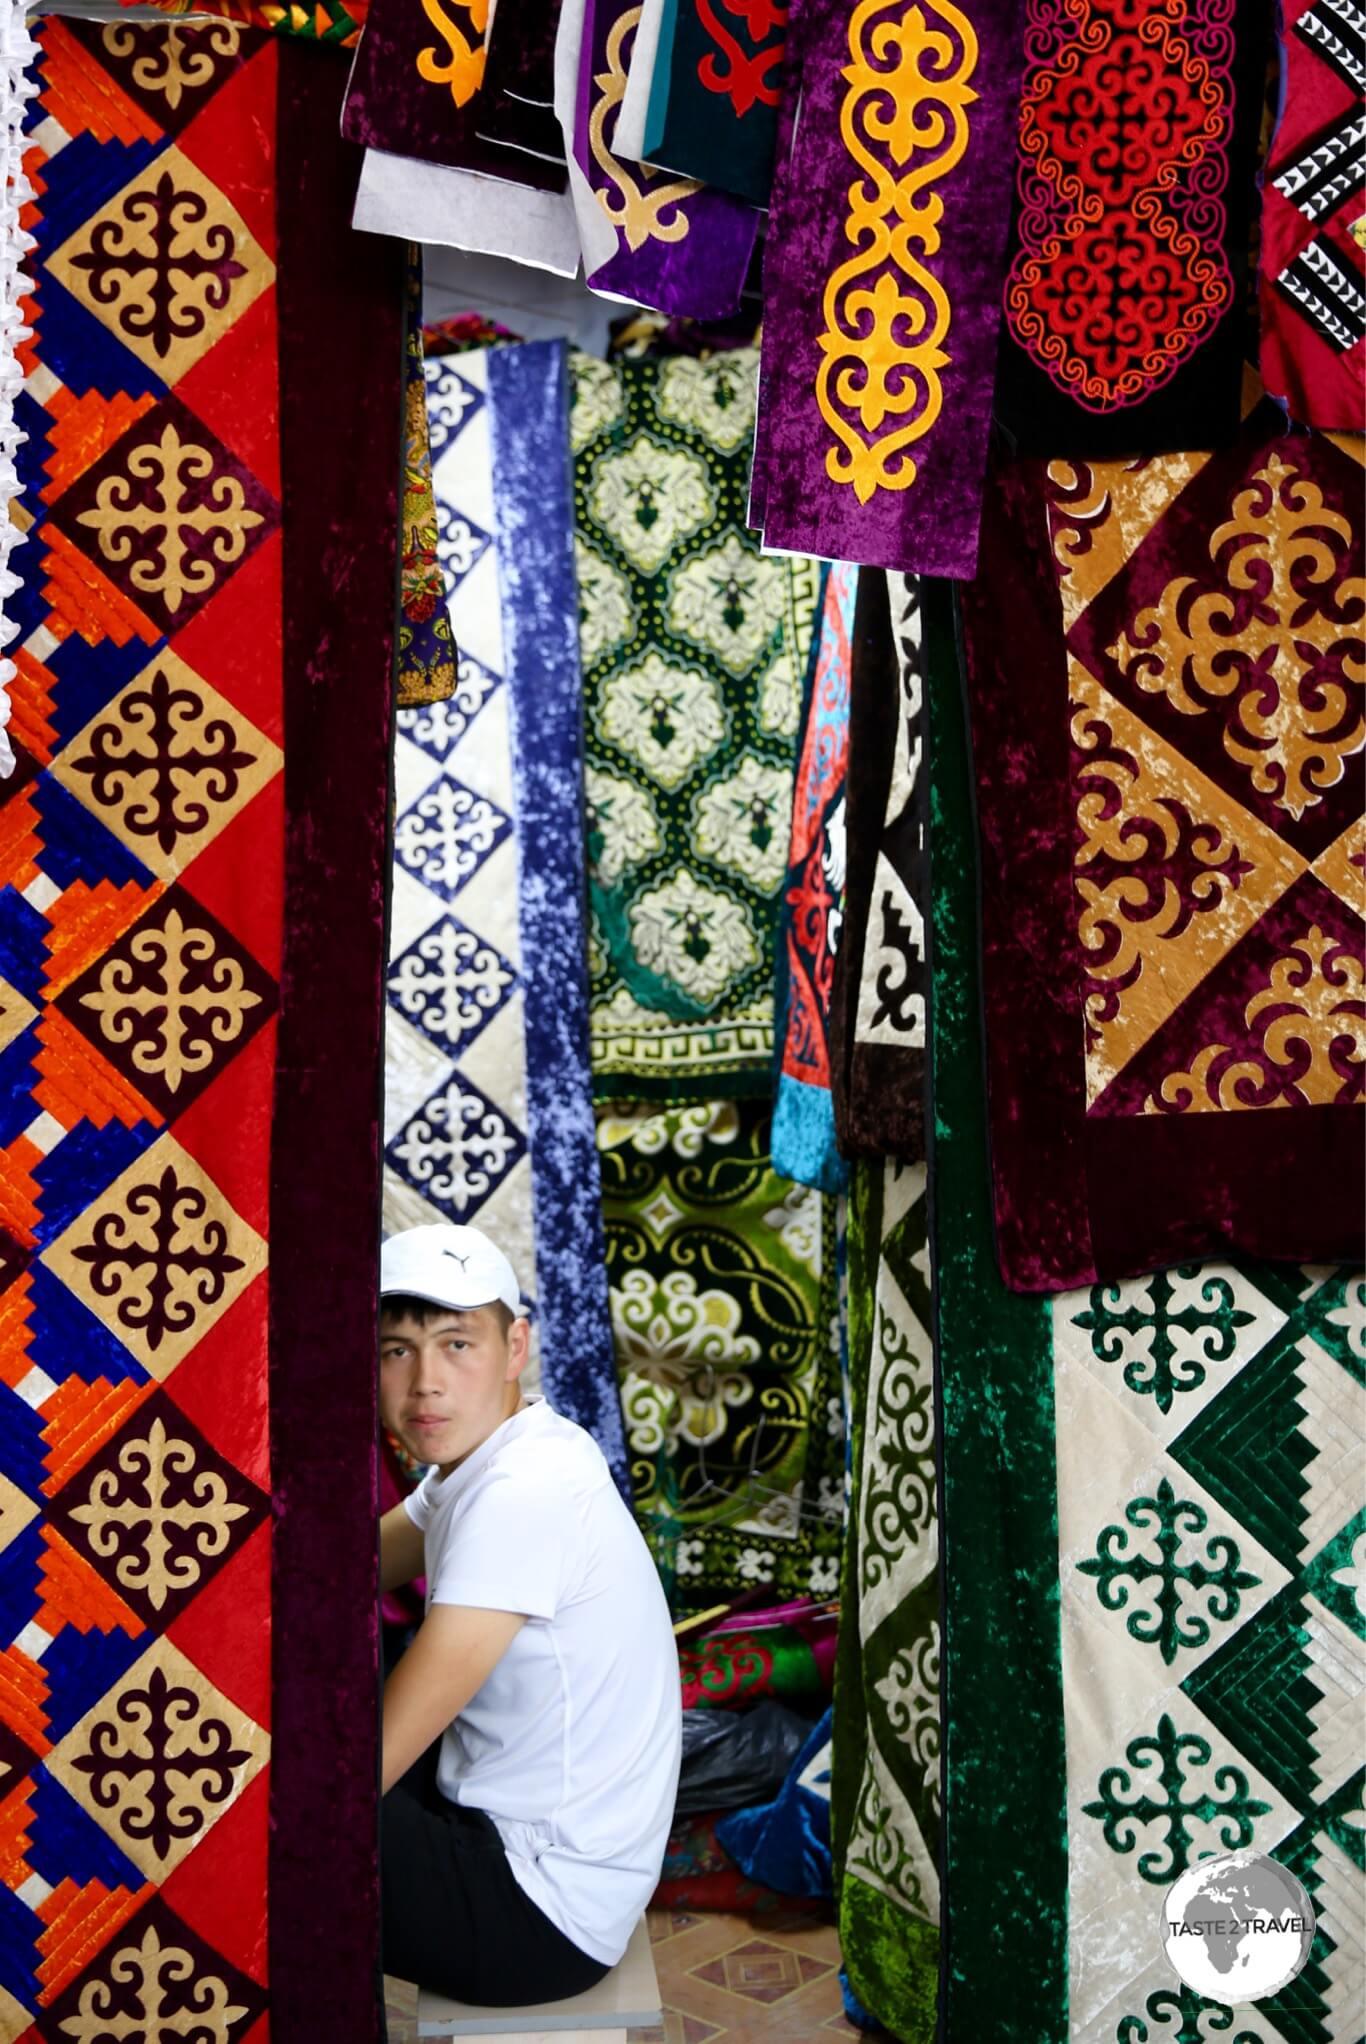 A shop-keeper at the Jayma bazaar.